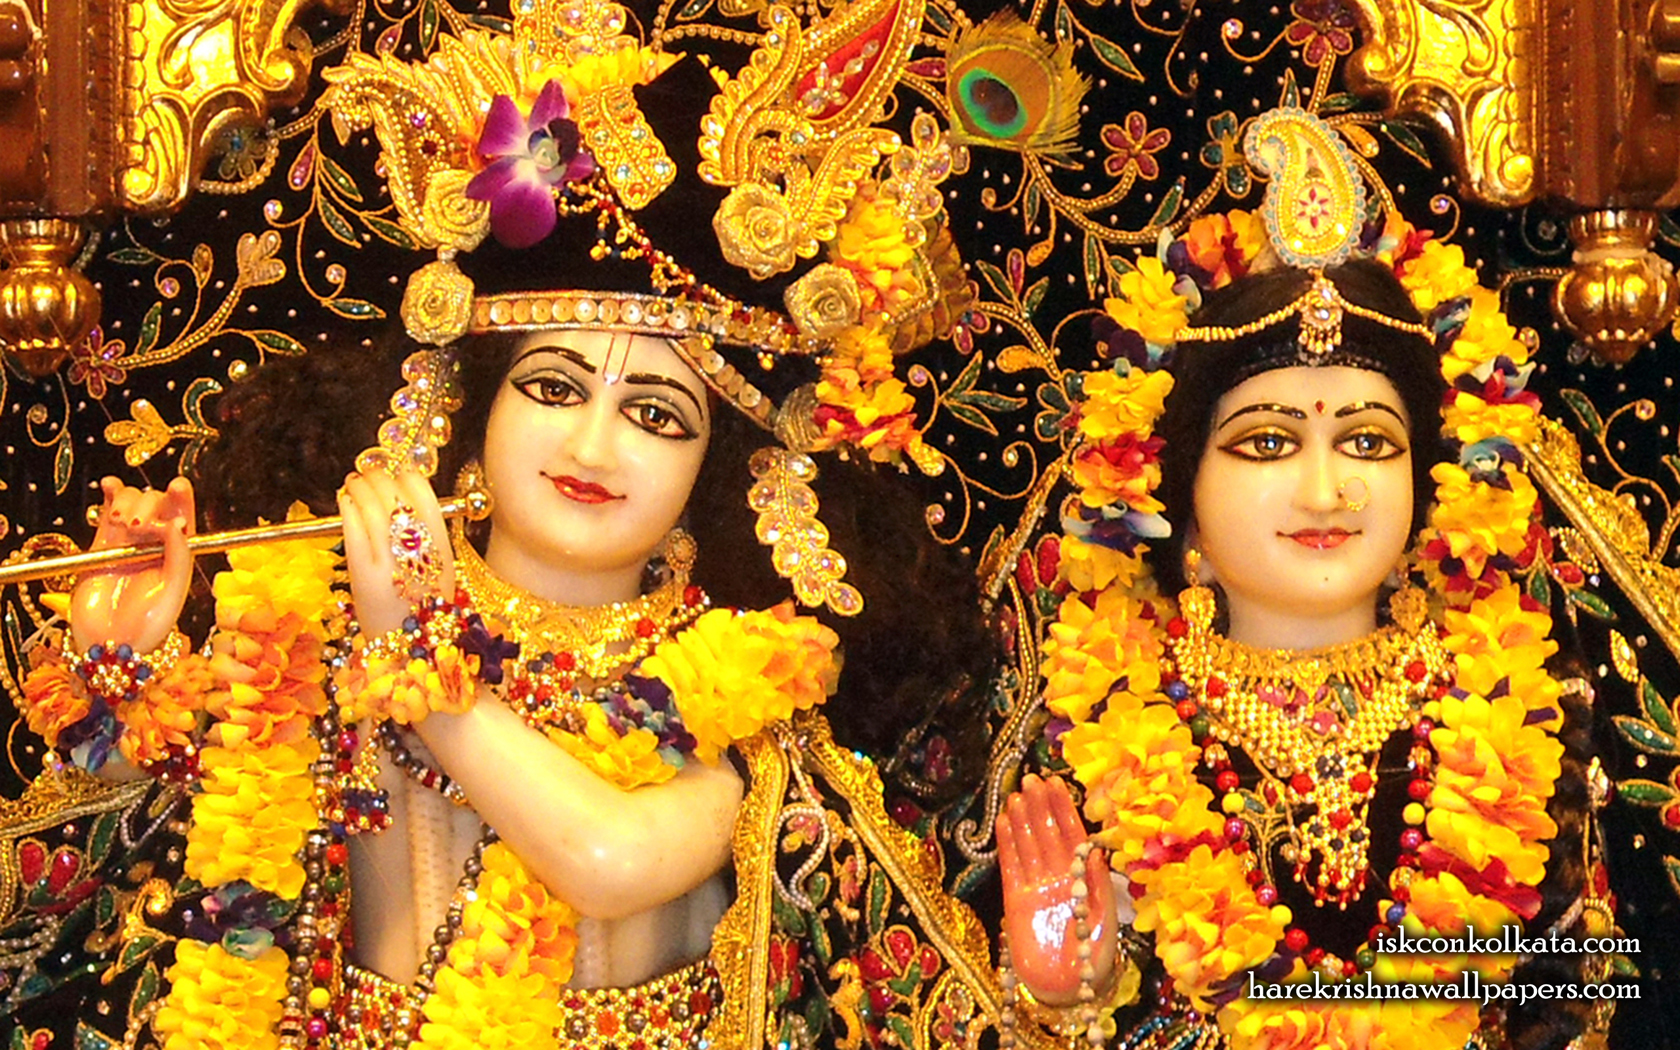 Sri Sri Radha Govinda Close up Wallpaper (001) Size 1680x1050 Download